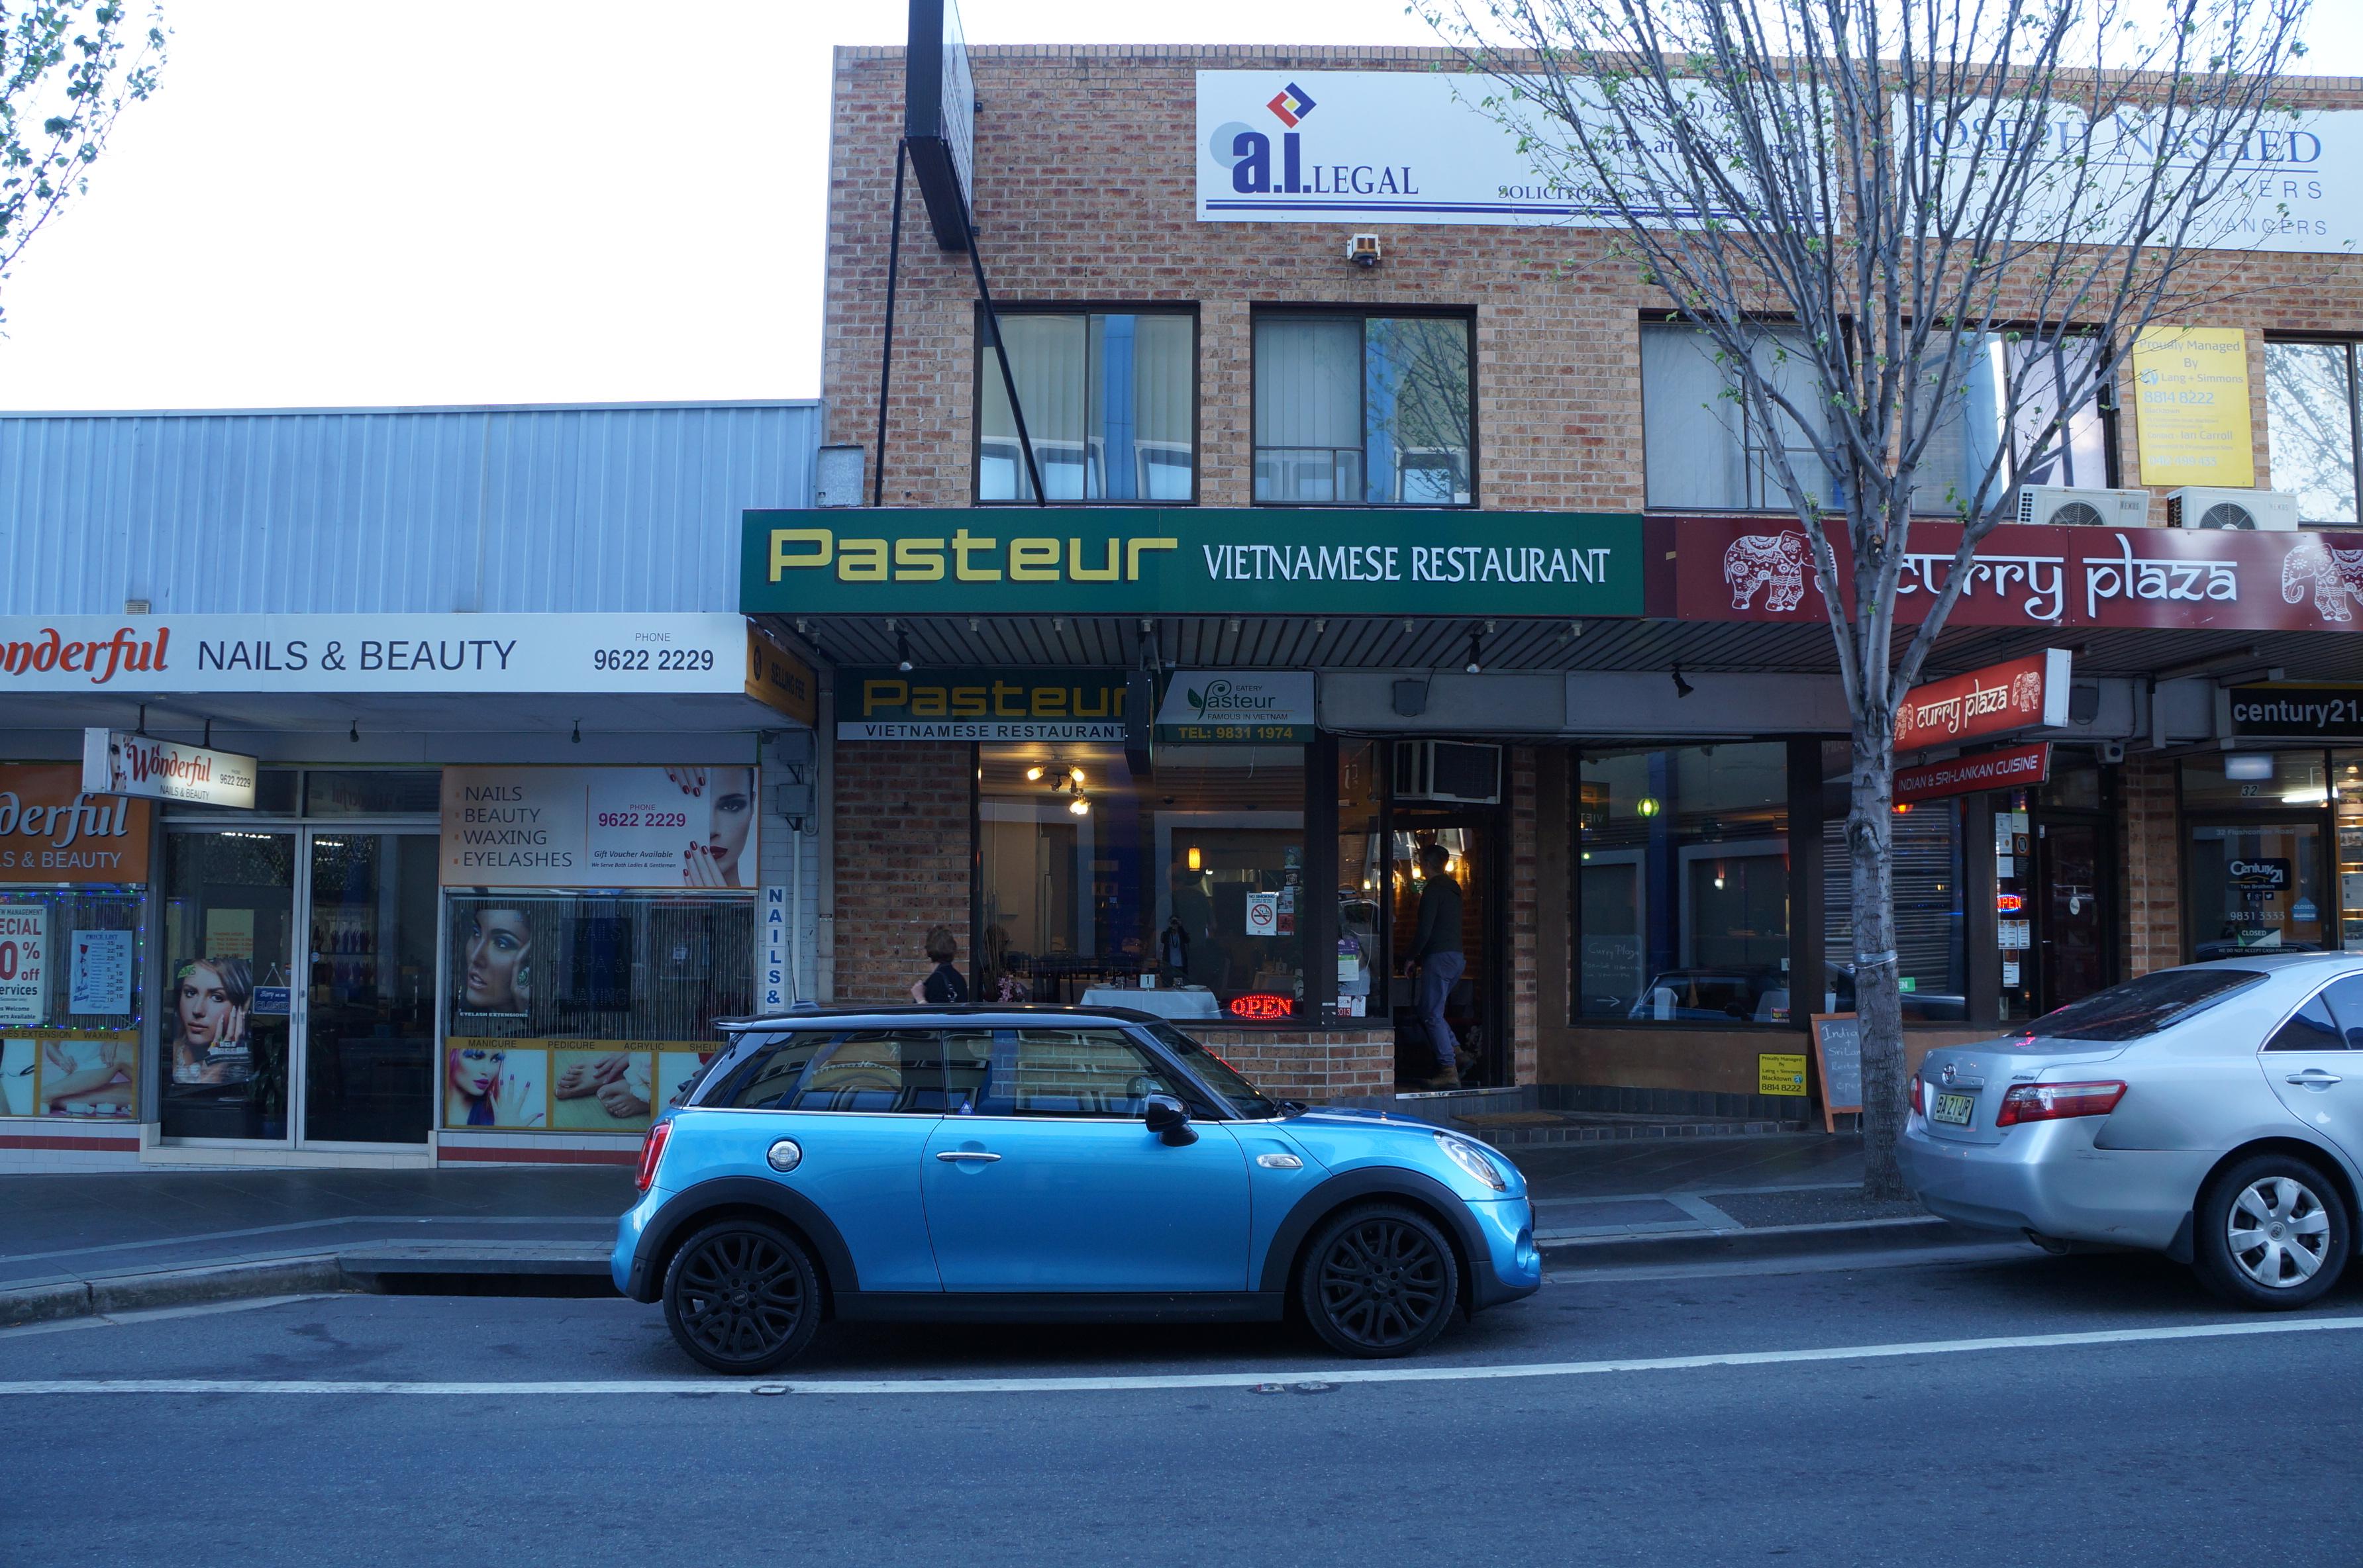 Pasteur Restaurant open for Business!